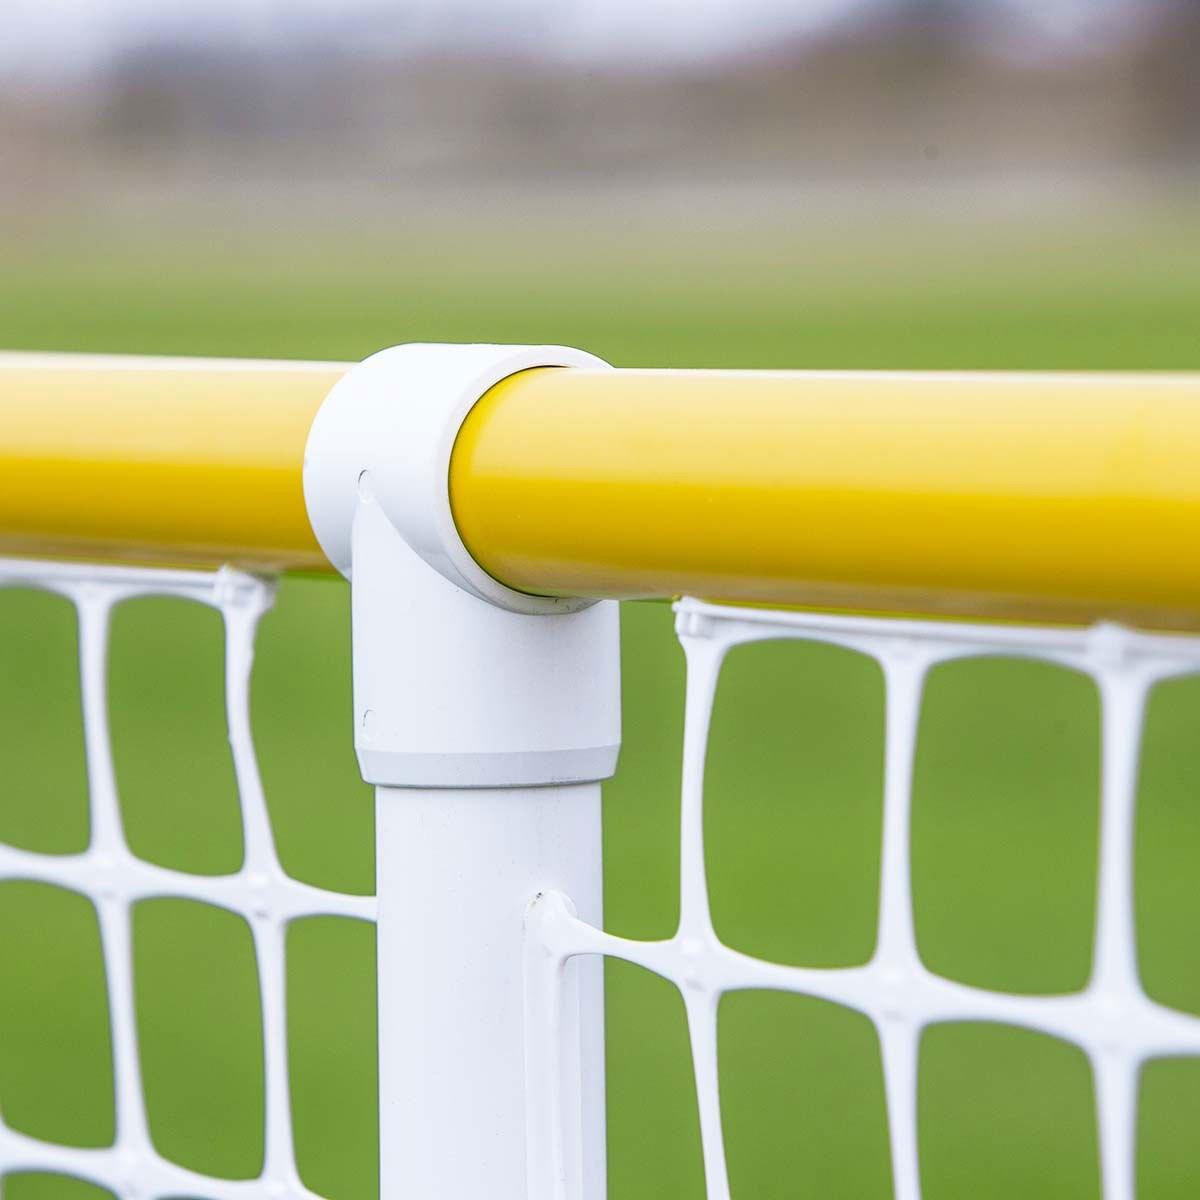 Signature Fence SportPanel w/ TechnoTip Portable Fencing